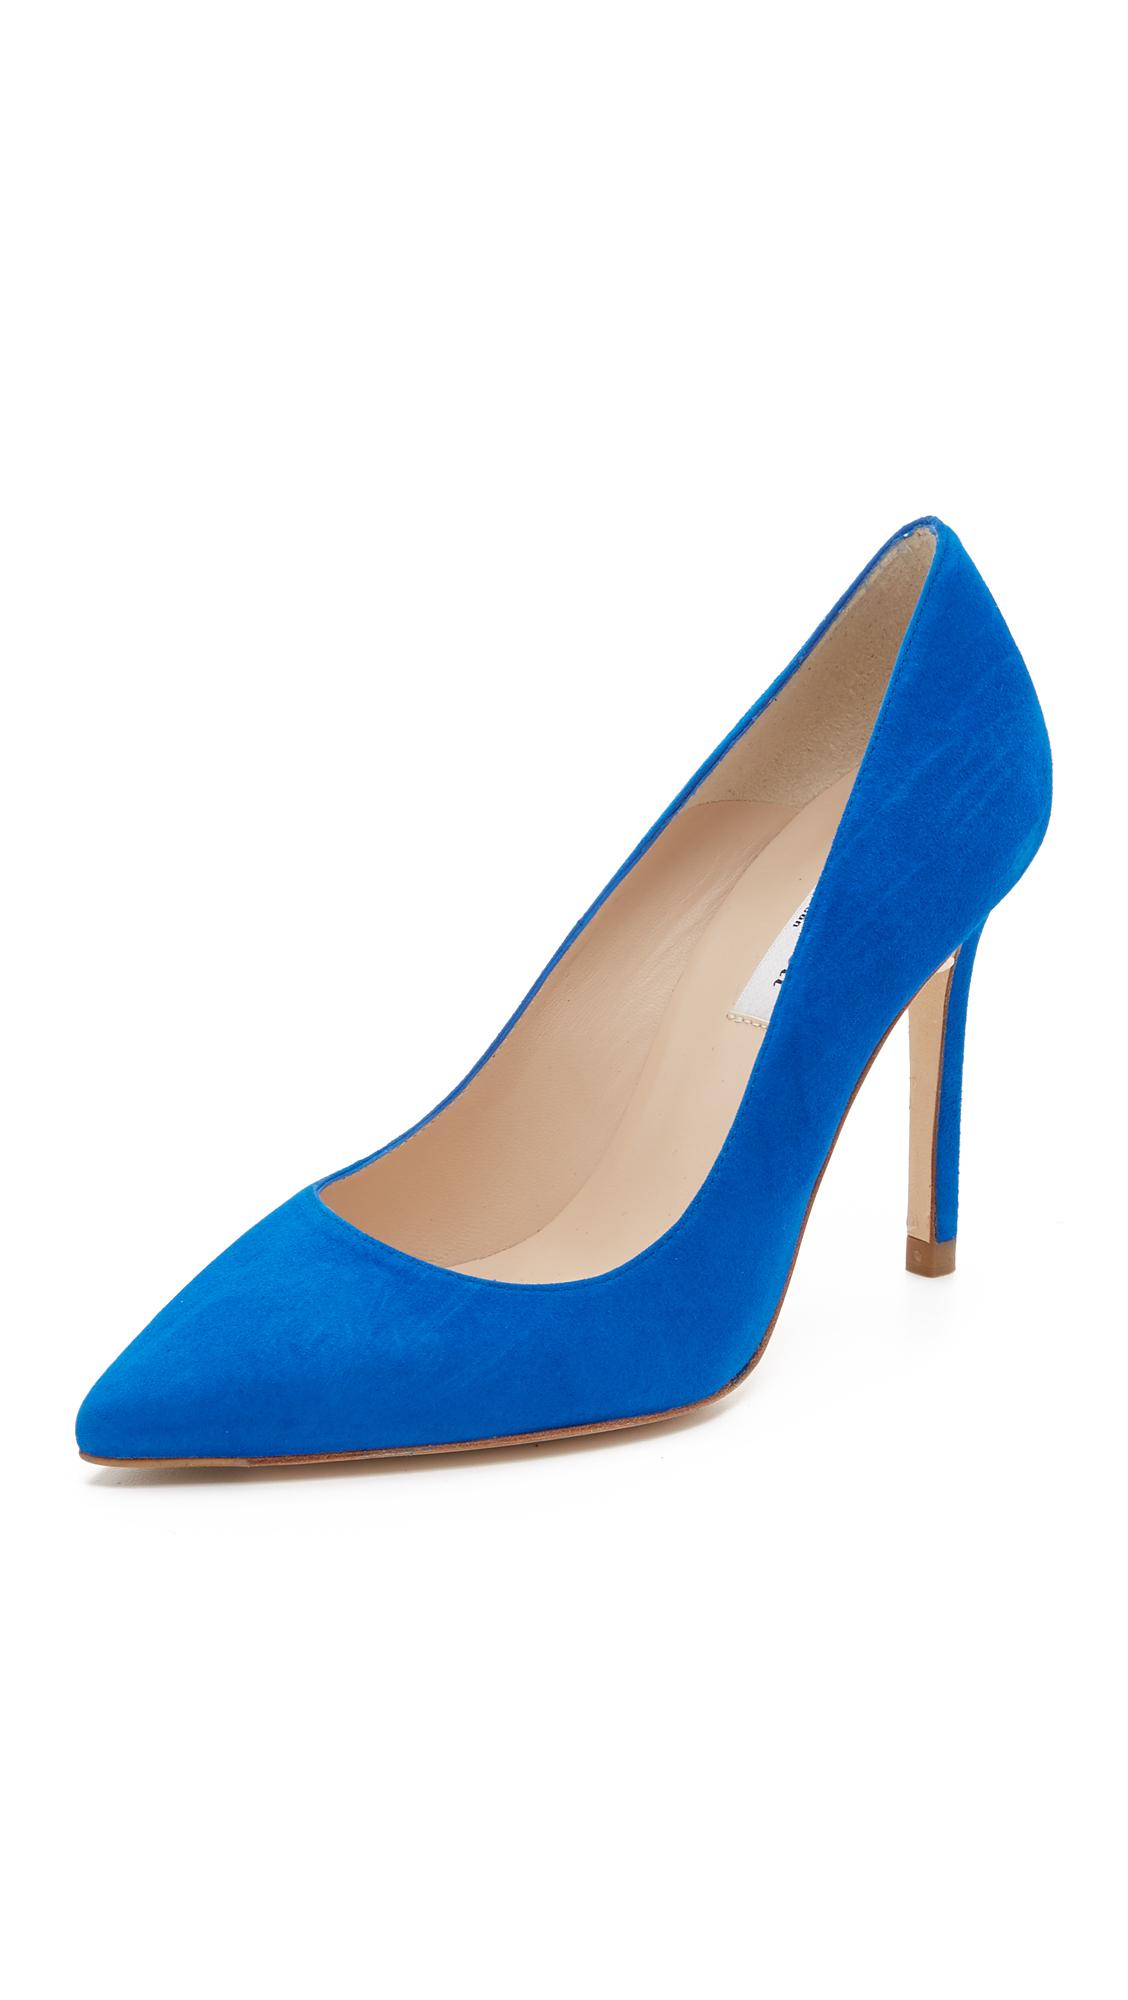 f26dbc6a14bf Lyst - L.K.Bennett Fern Suede Pointy Toe Pumps in Blue